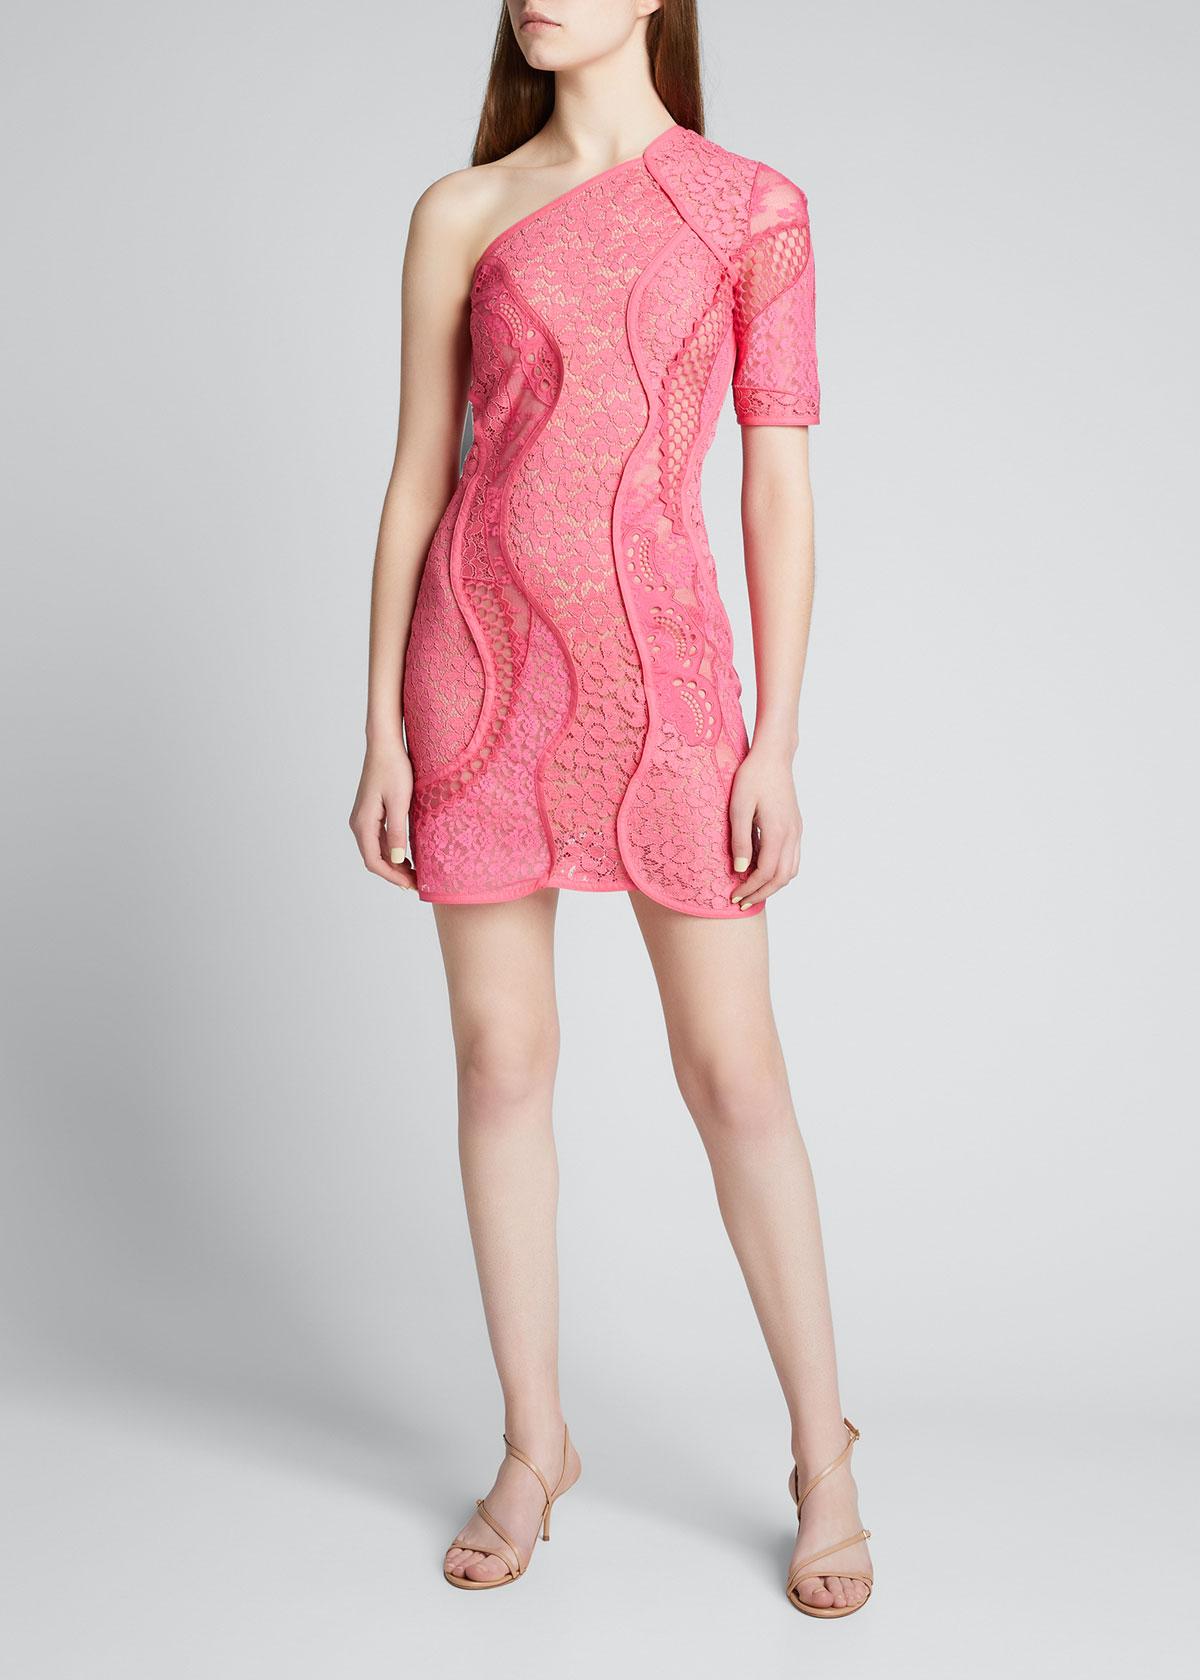 Stella Mccartney Mini dresses ONE-SHOULDER LACE MINI DRESS